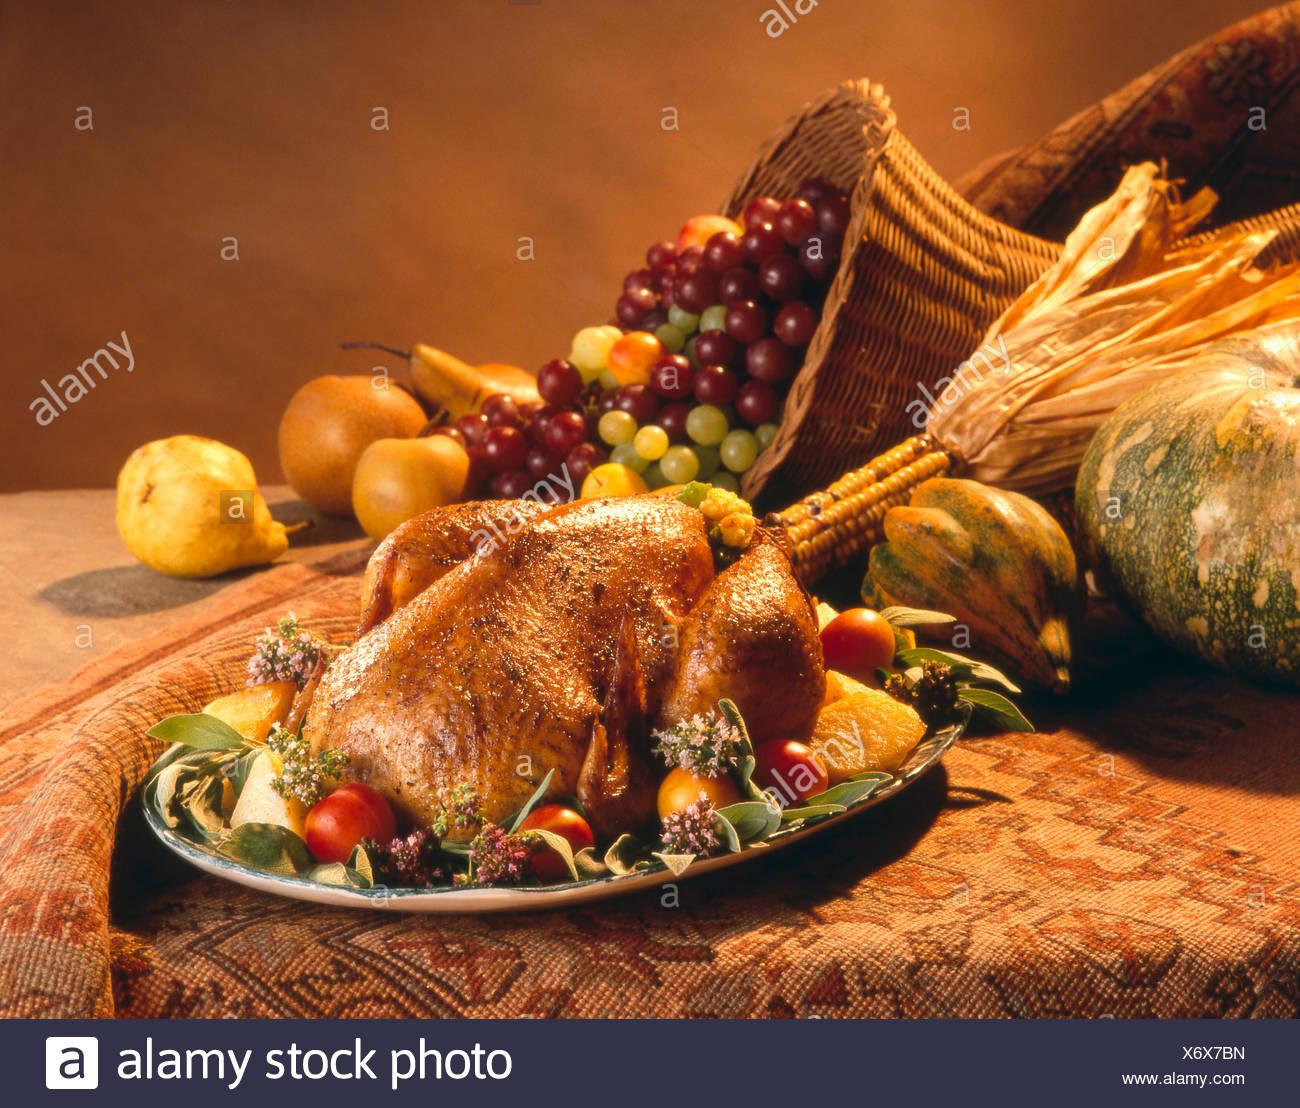 Thanksgiving Turkey on a Platter with Fruit, Cornucopia - Stock Image